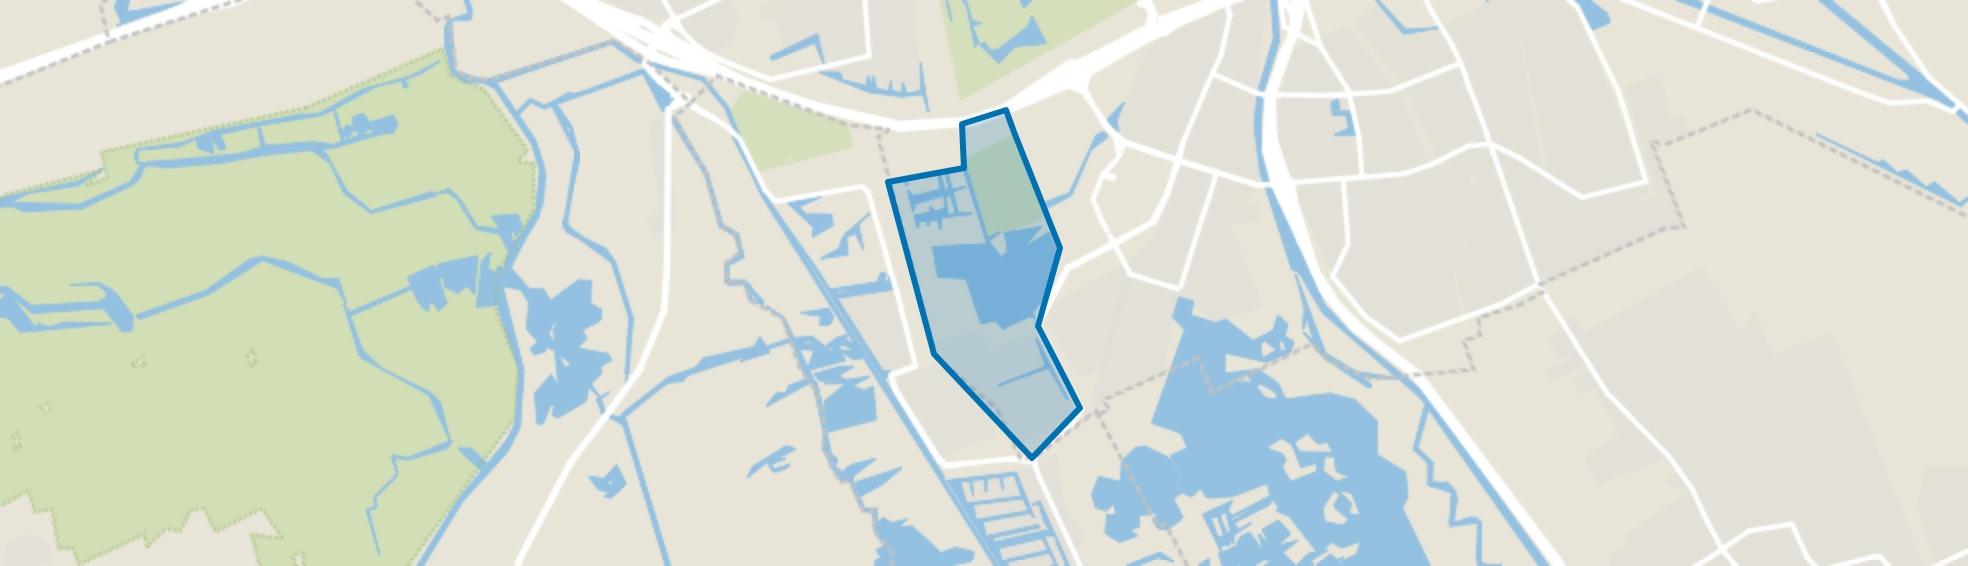 Piccardthof, Groningen map